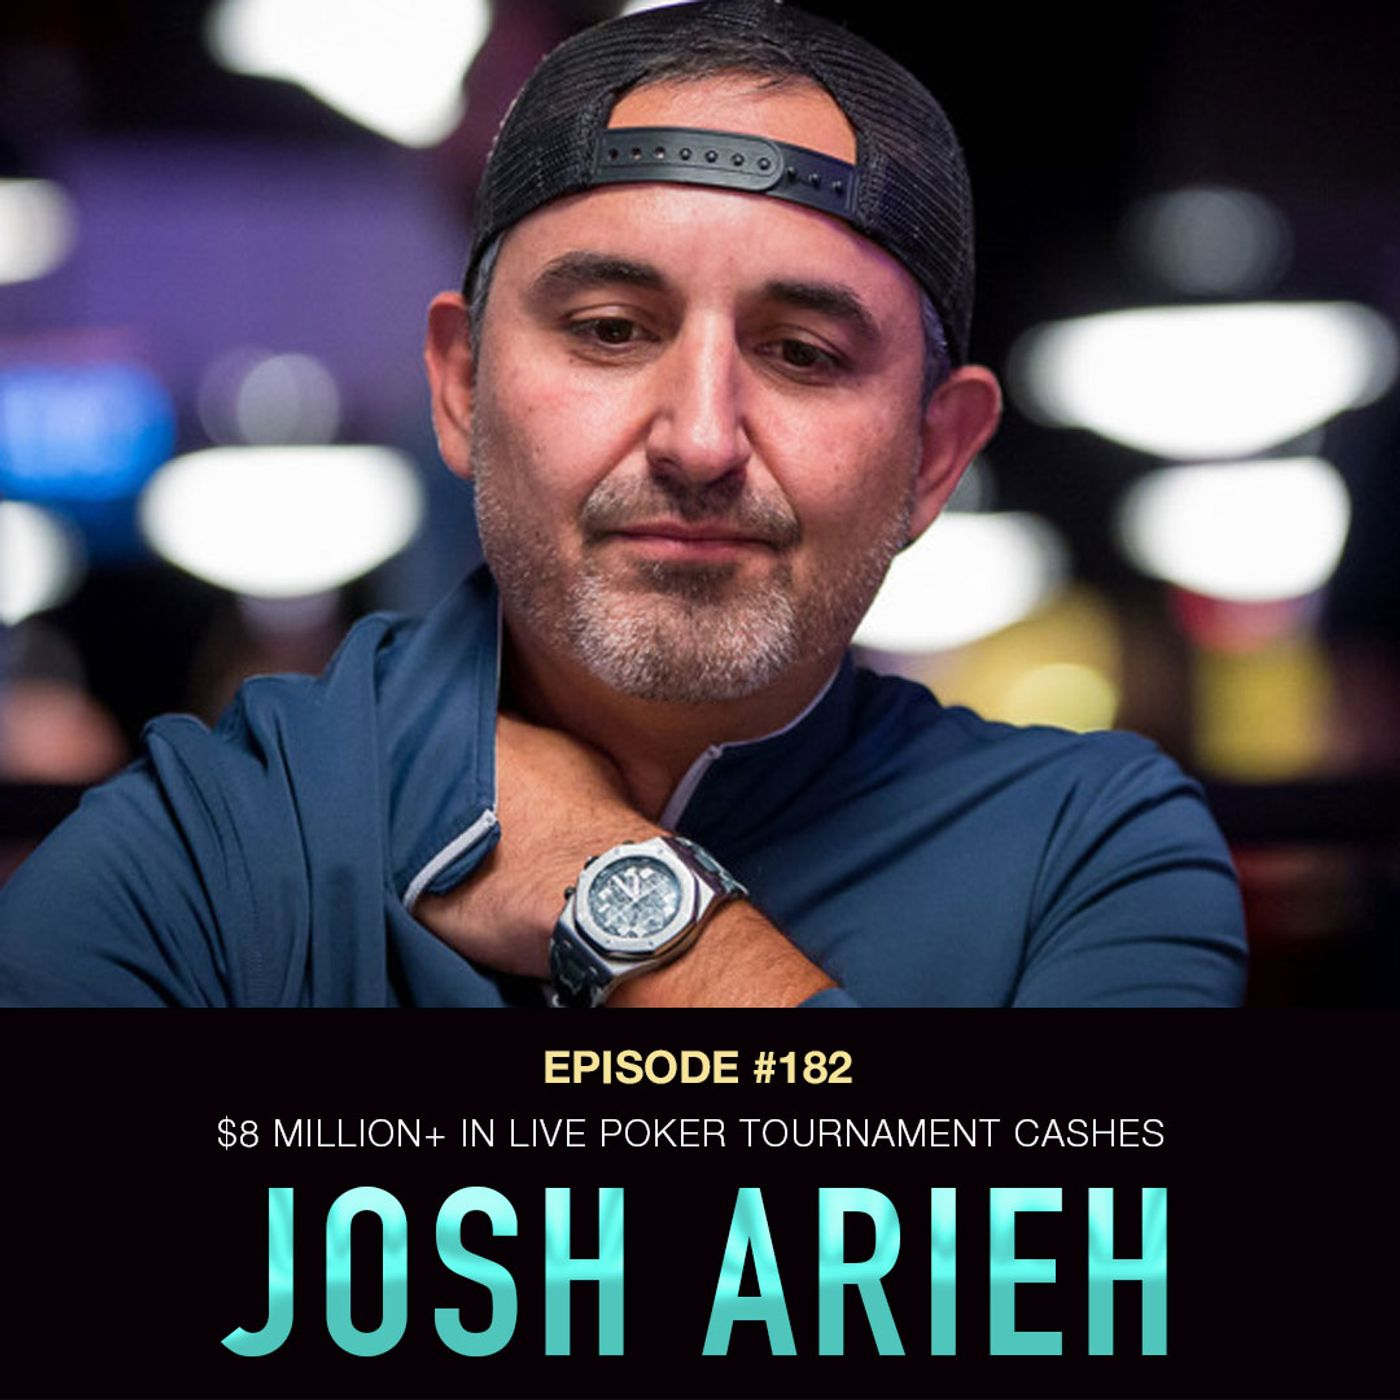 #182 Josh Arieh: $8 Million+ in Live Poker Tournament Cashes